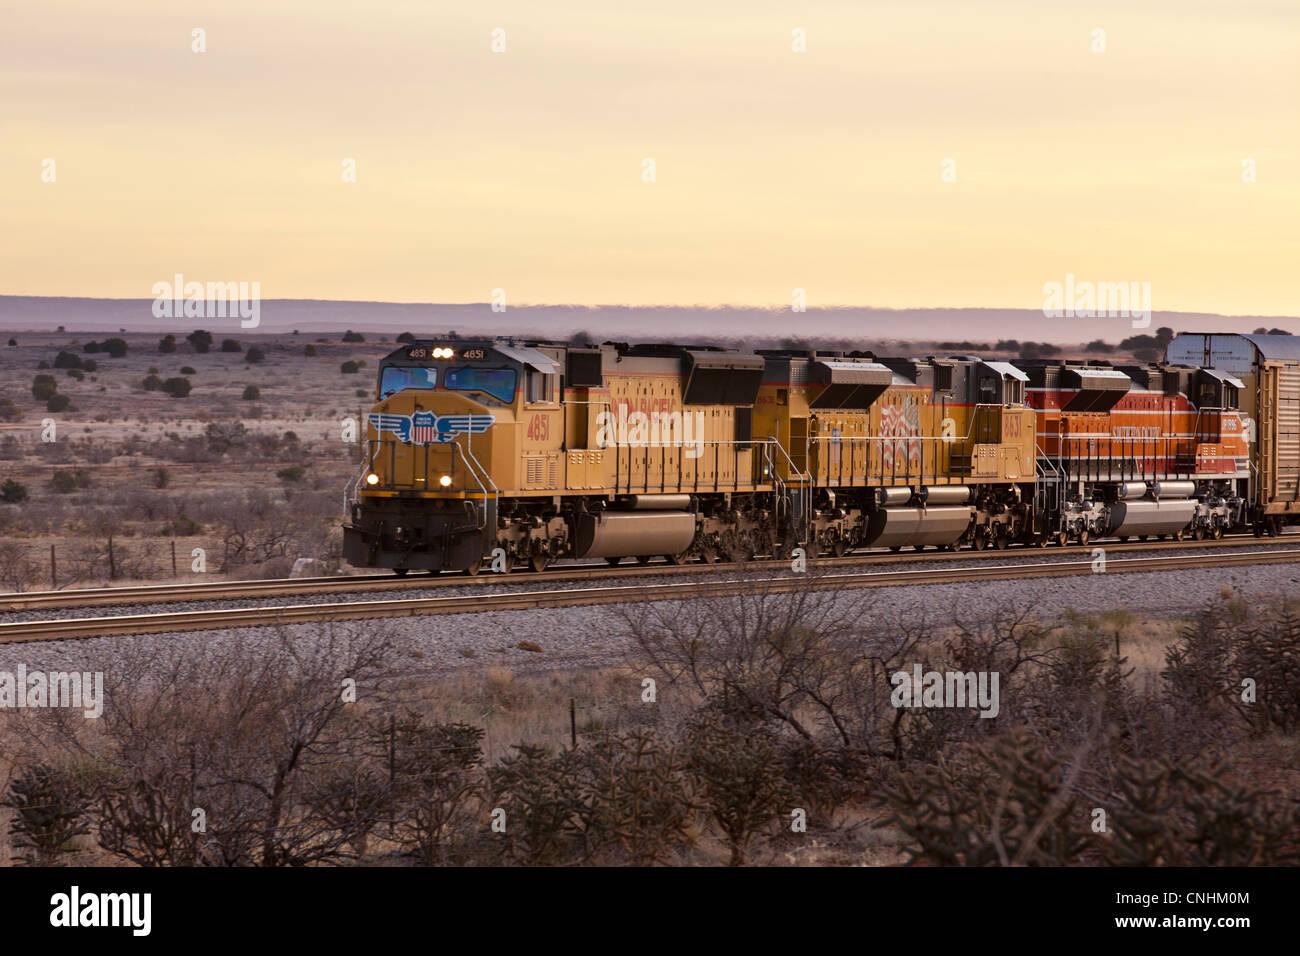 Union Pacific Railroad EMD SD70 series locomotive Stock Photo